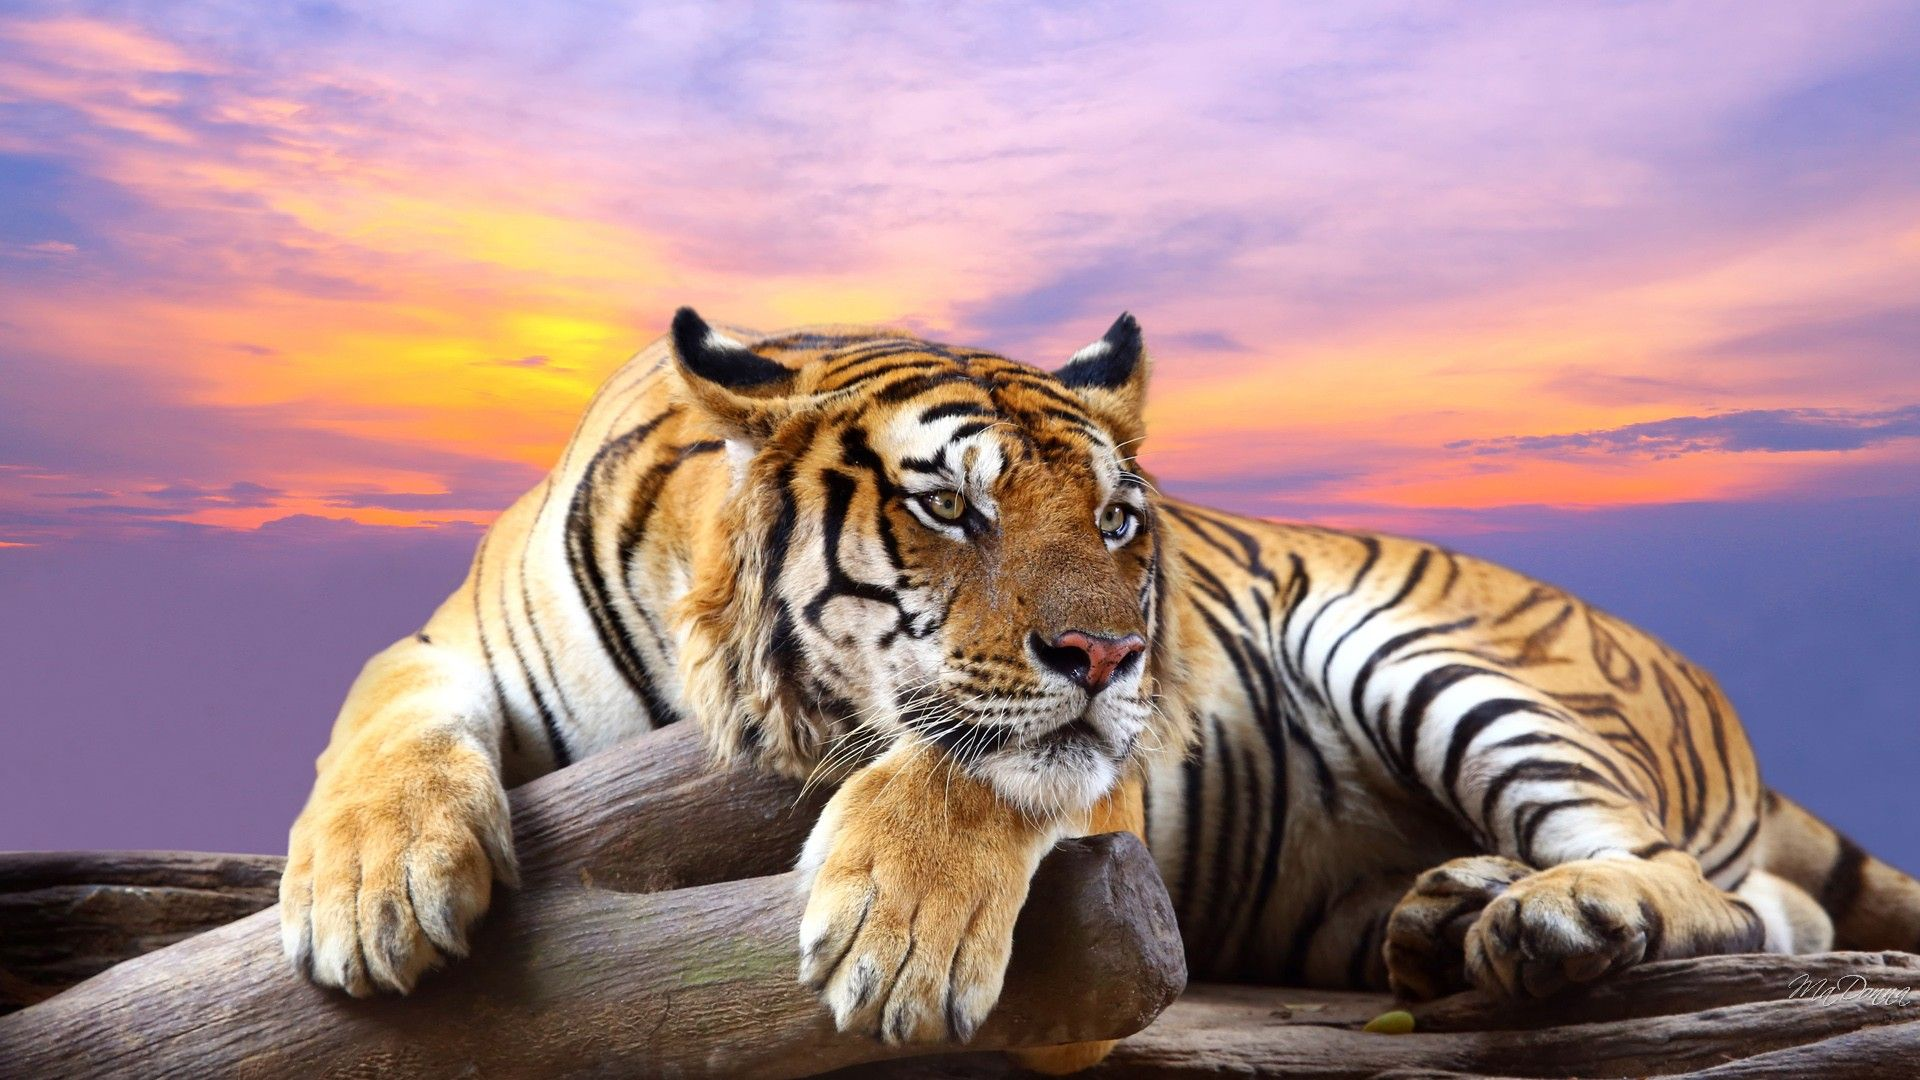 tiger wallpaper desktop background | animals wallpapers | pinterest